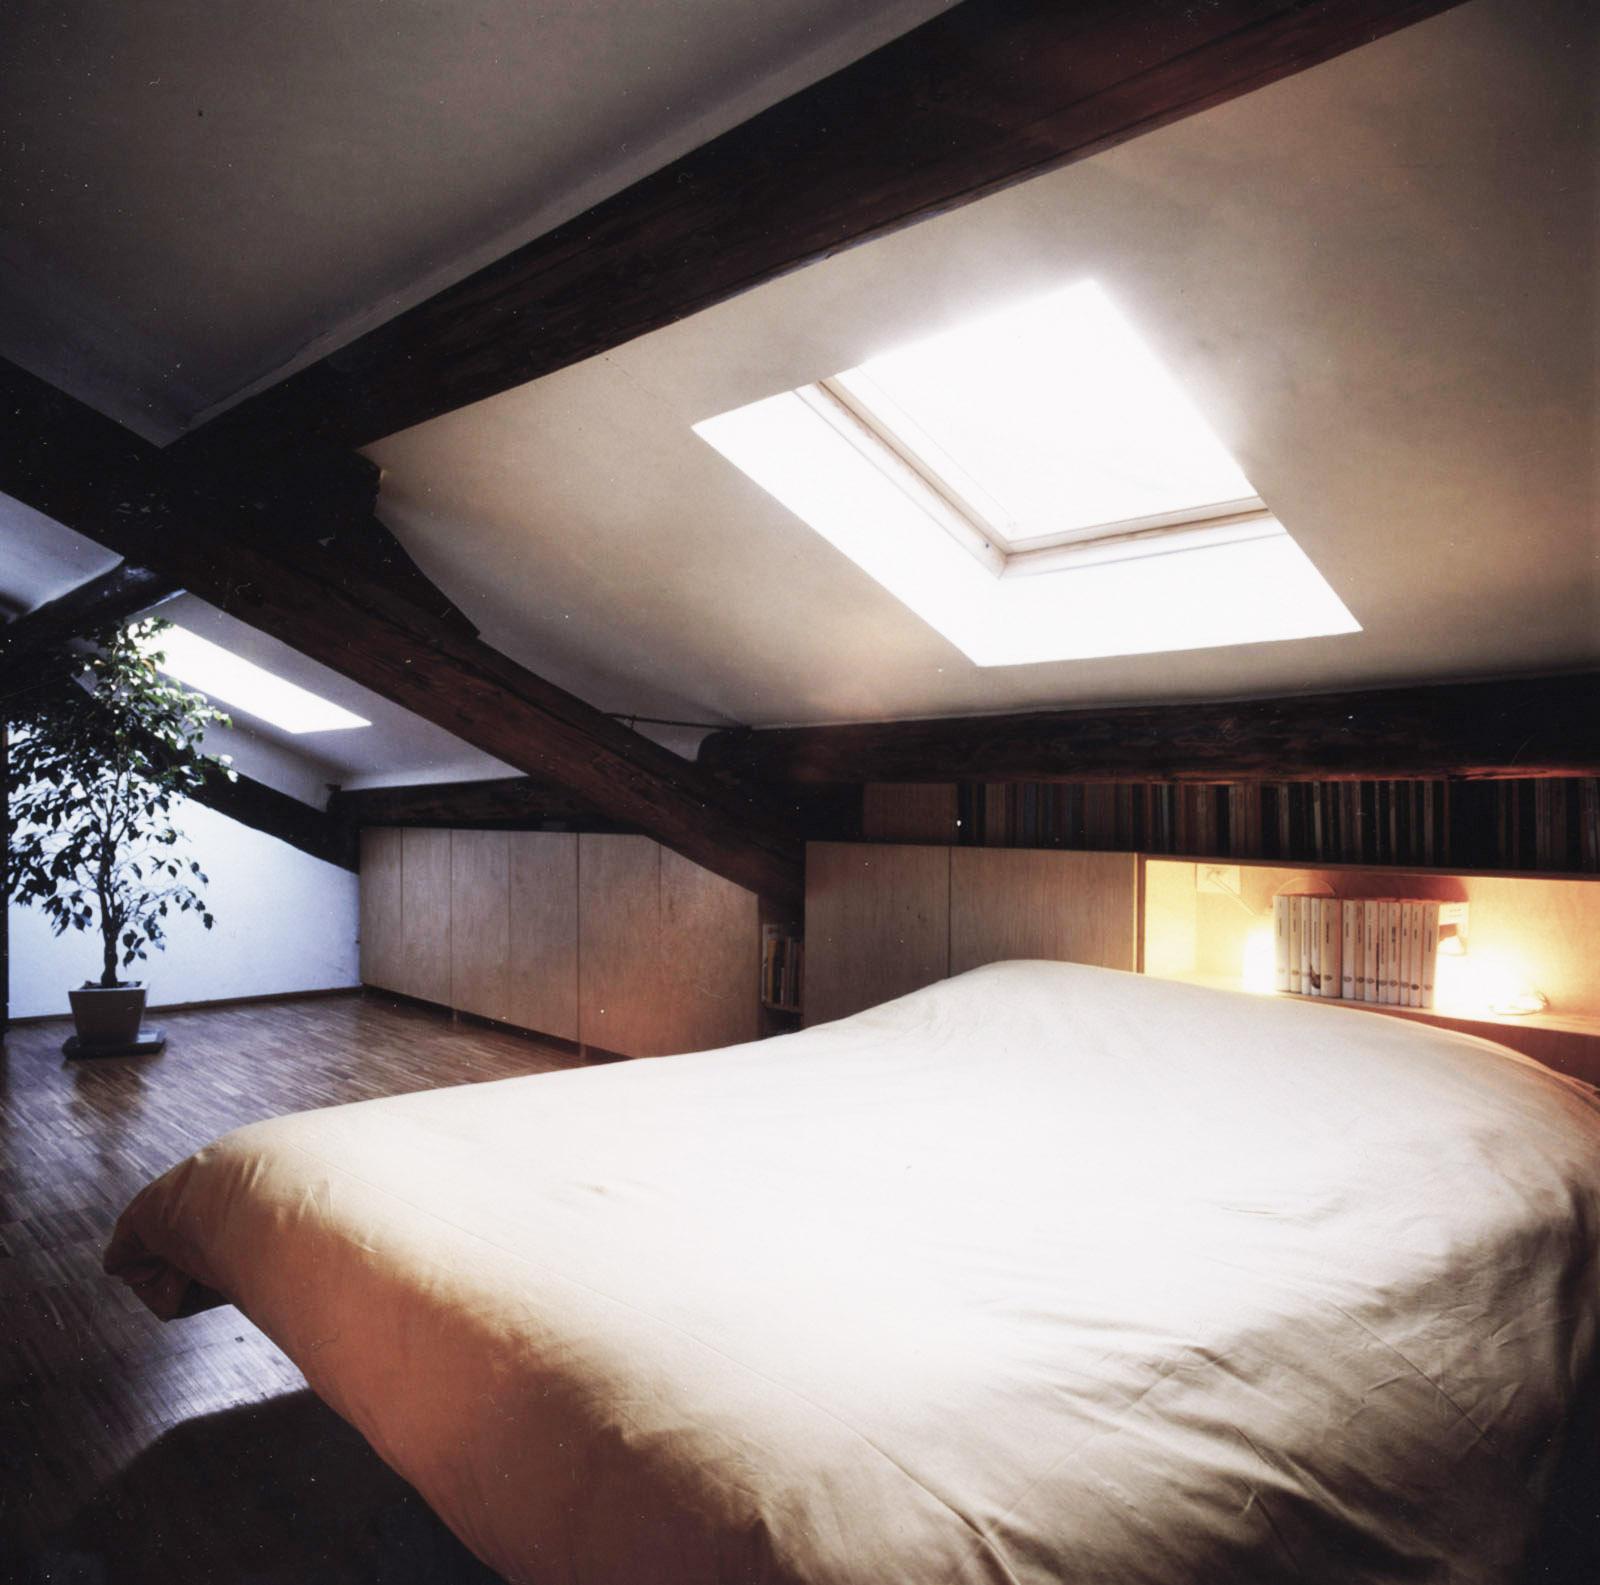 abitazione in casa di ringhiera a Milano